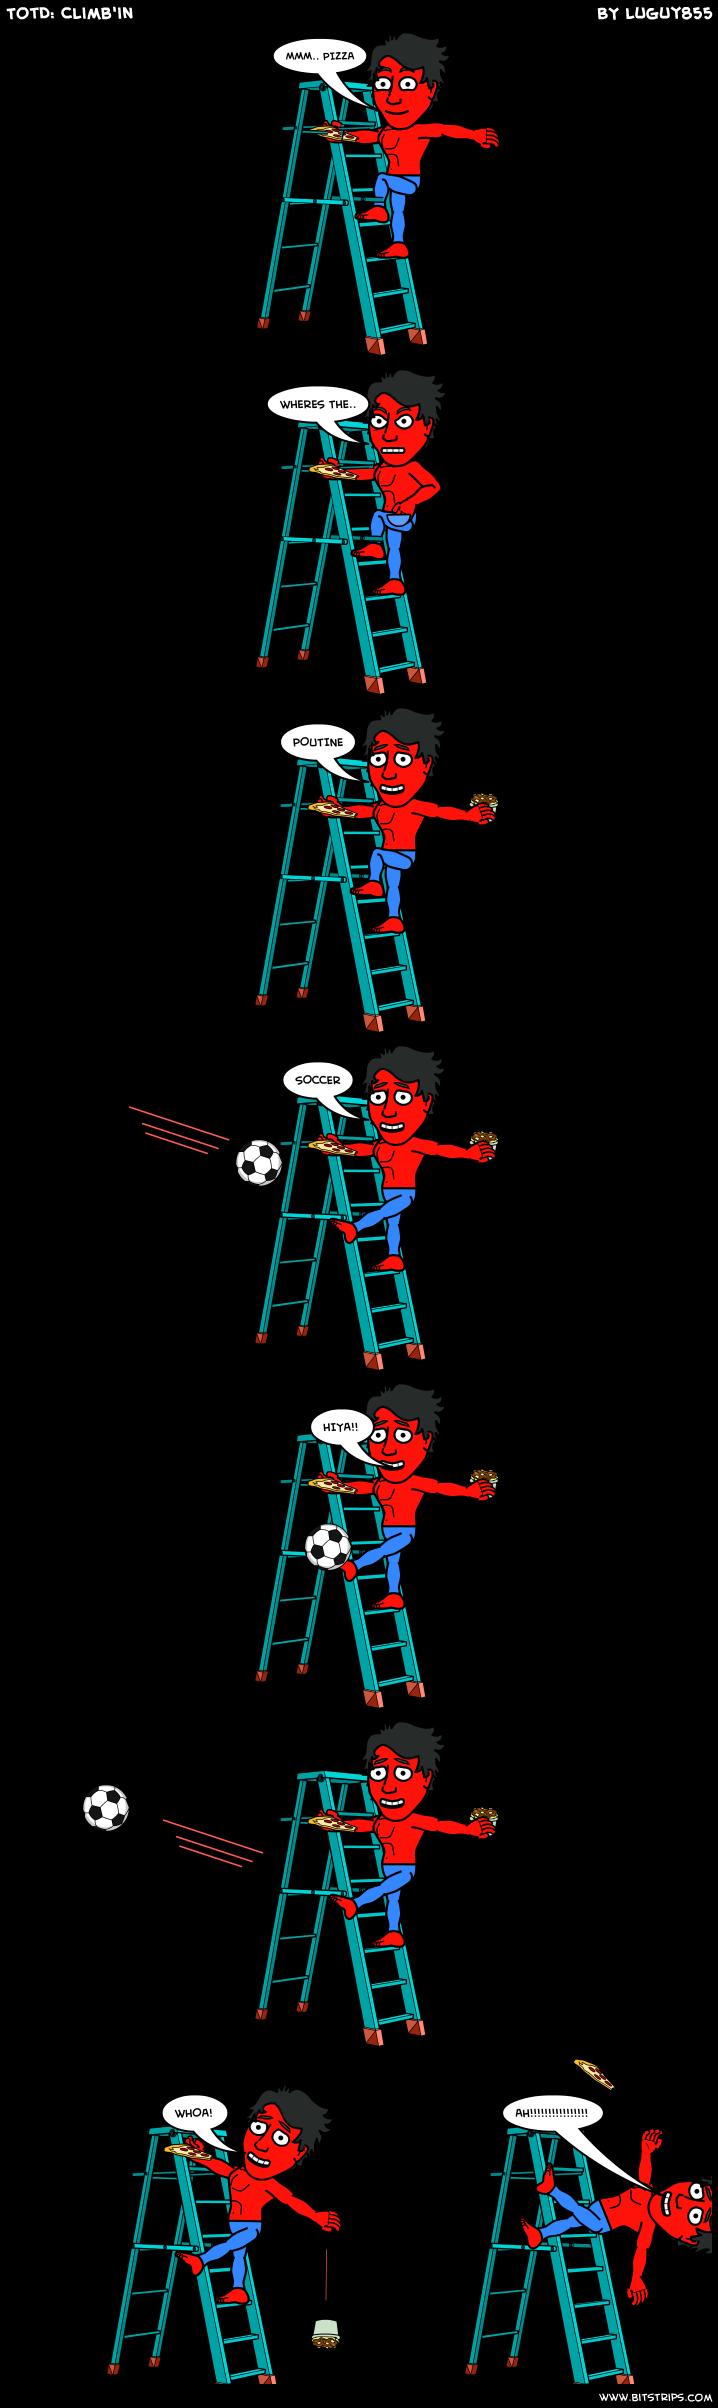 TotD: Climb'in